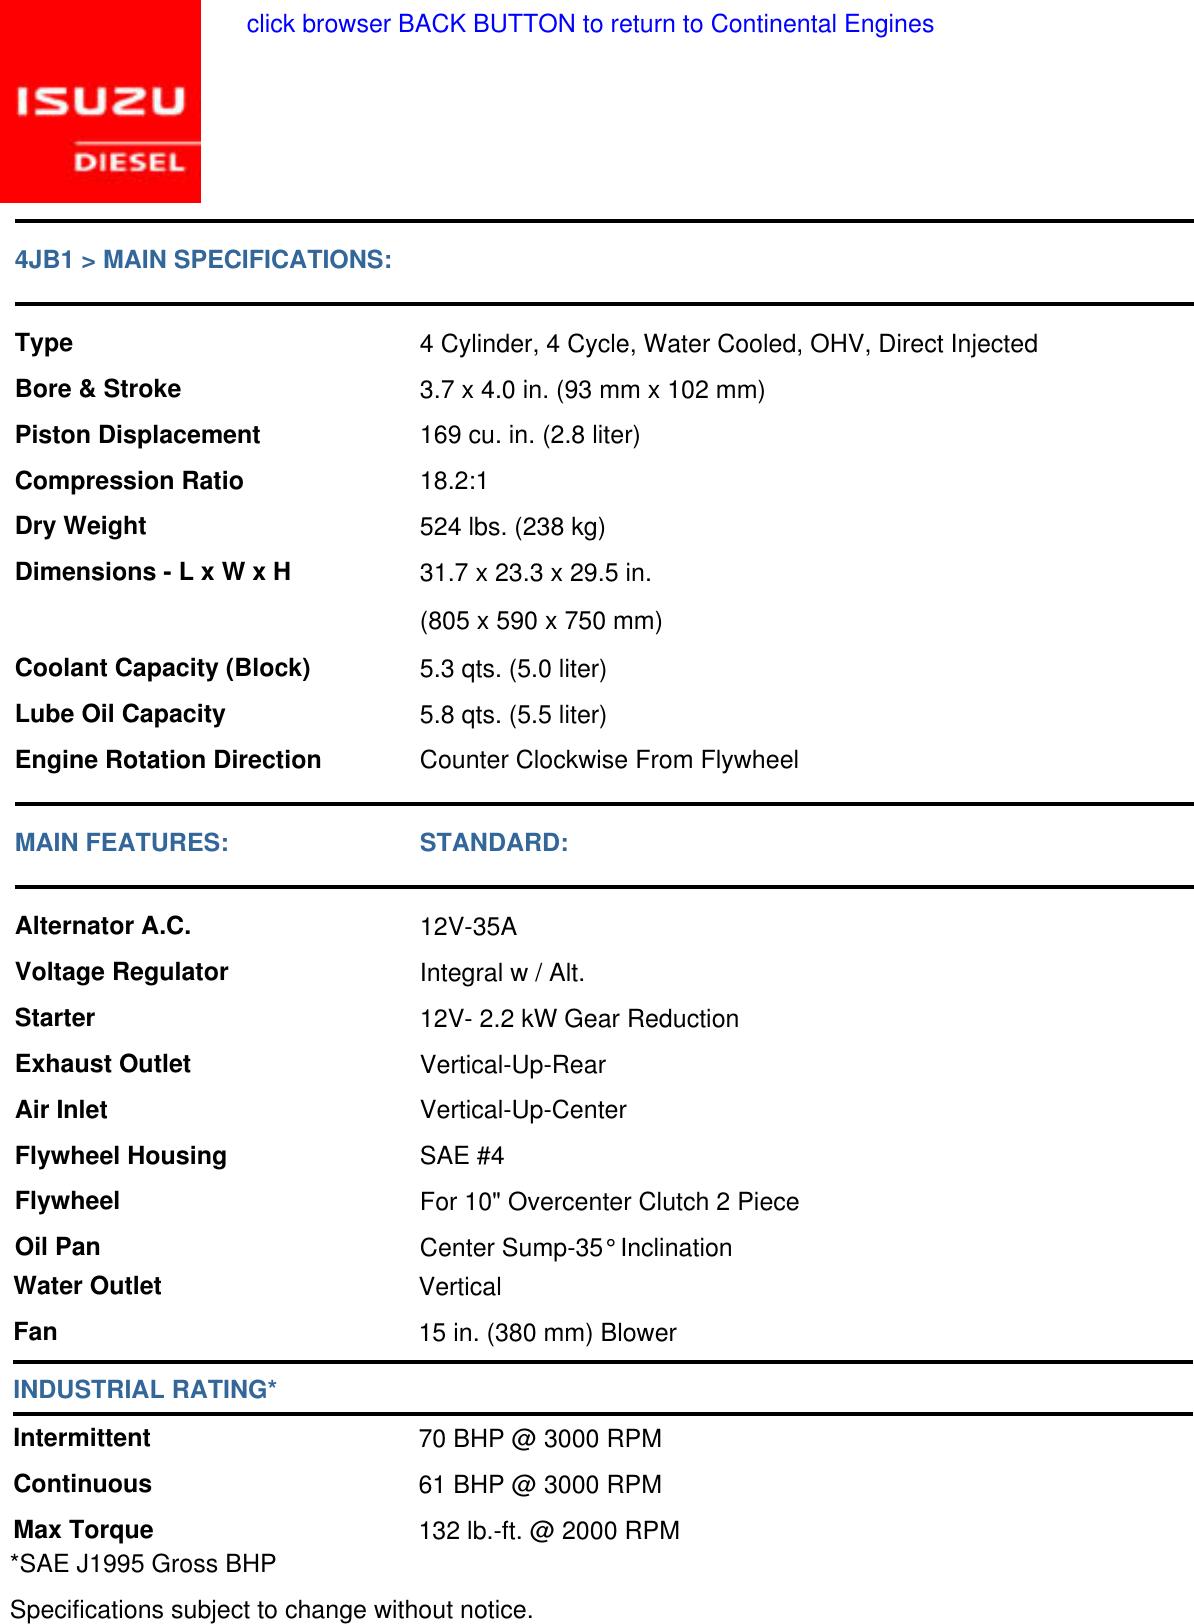 Isuzu 4JB1 Engine Specifications